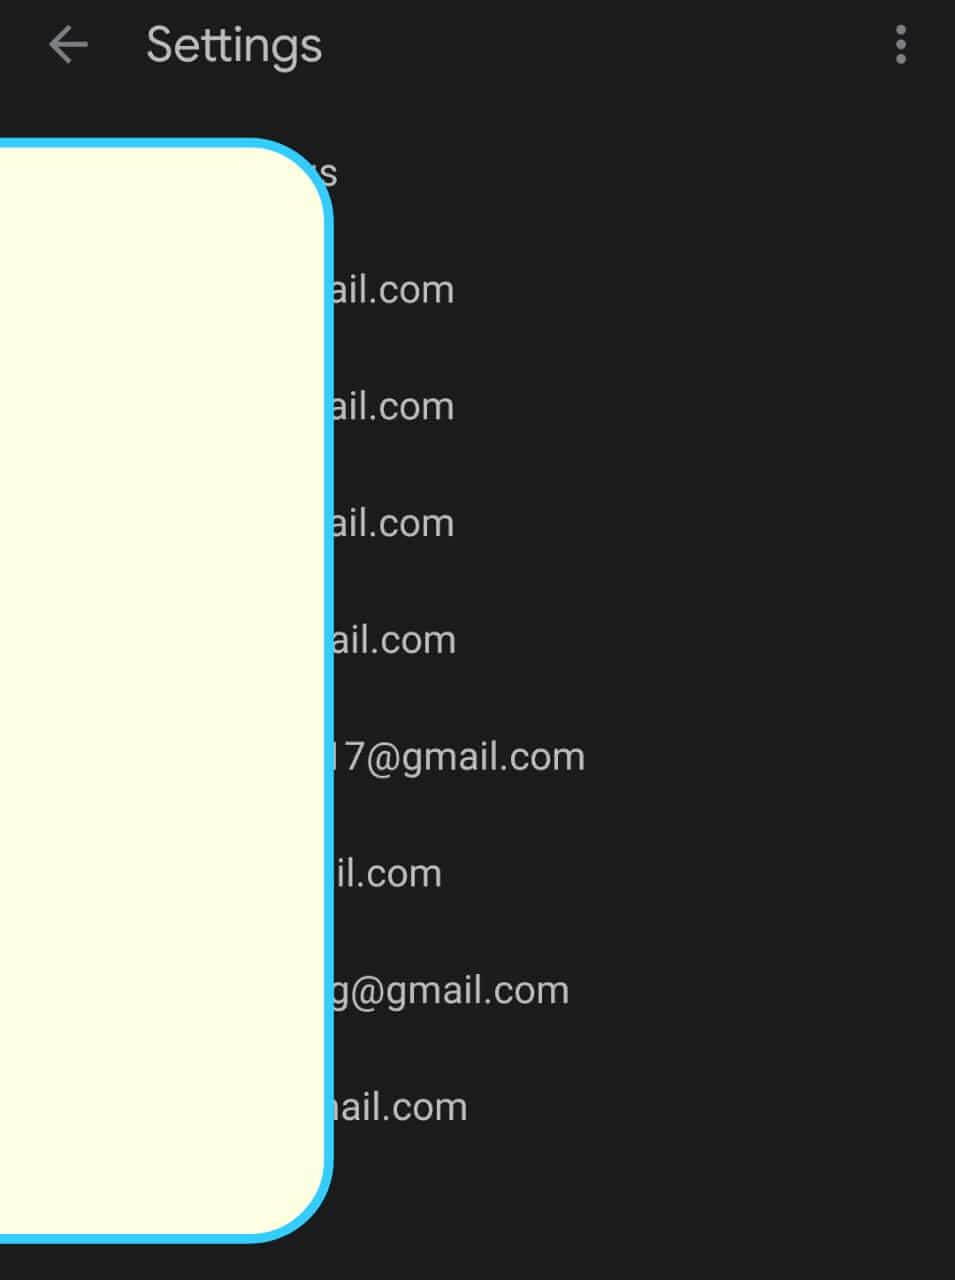 Gmail ID का Password Change कैसे करें Gmail Id का Password कैसे बदलें Email id का Password कैसे बदलें Gmail id का Password forgotten कैसे करें अपने मोबाइल से Gmail id का Password कैसे चेंज करें।